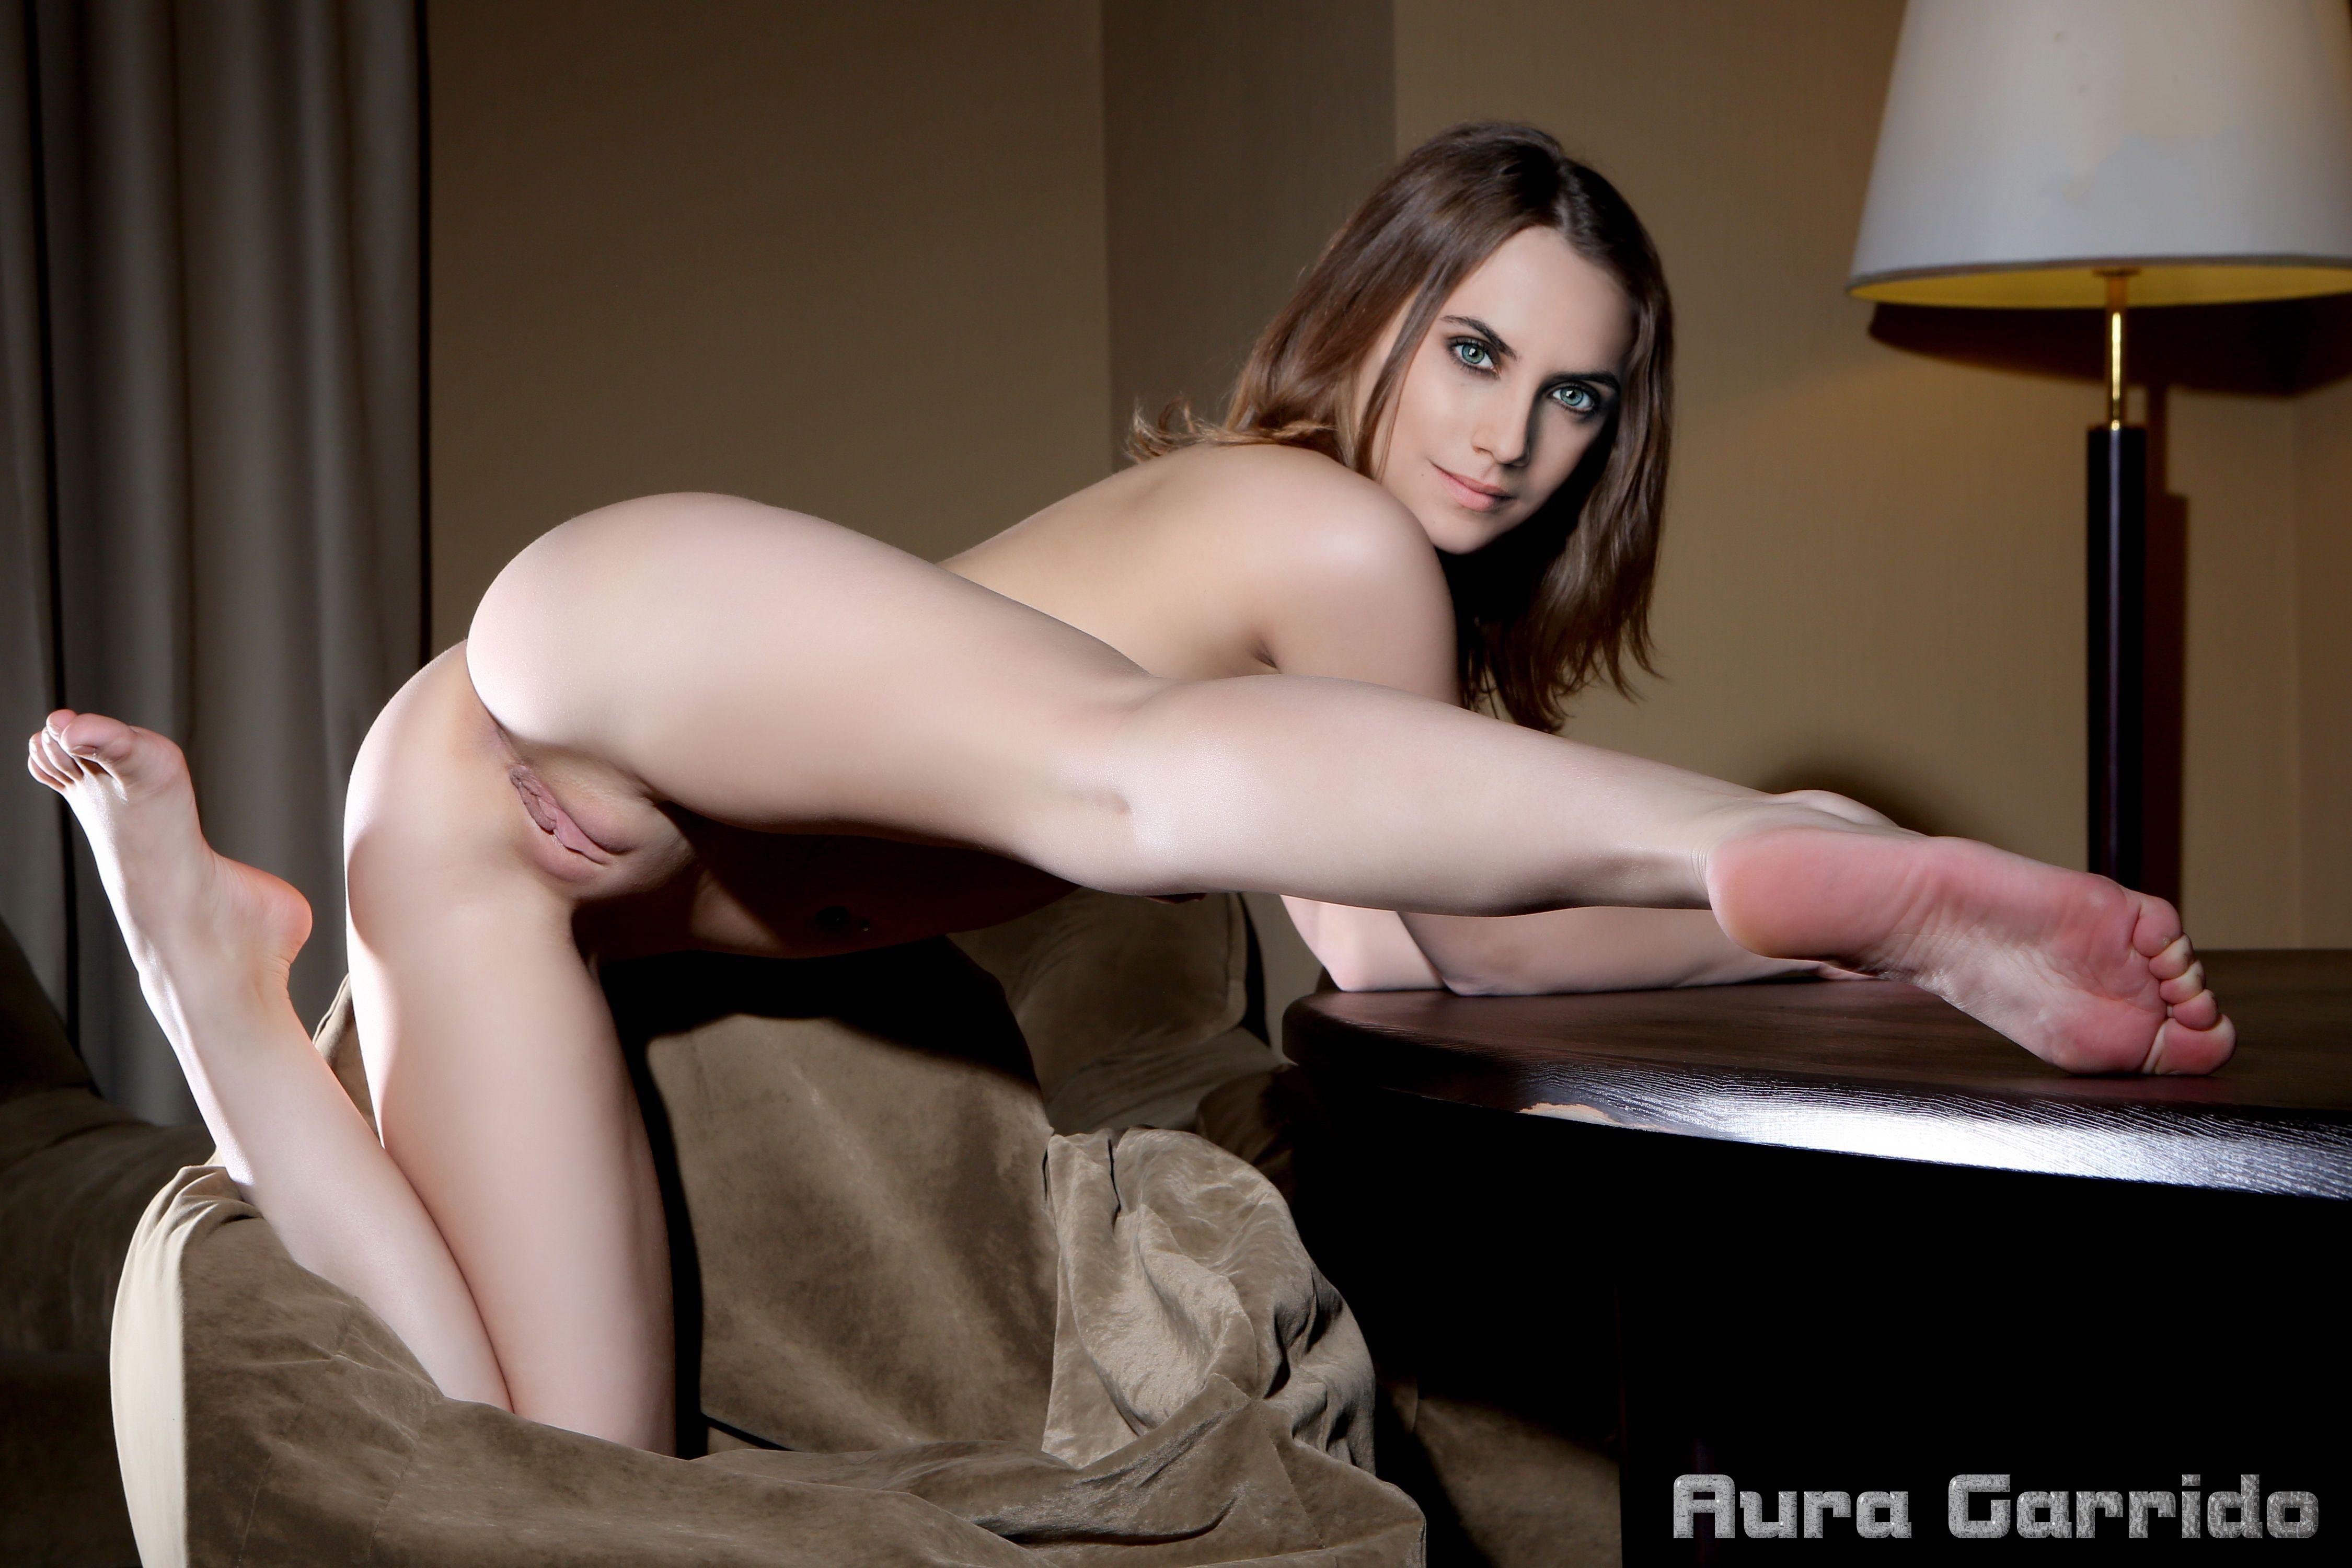 Aura Garrido Nude wallpaper aura garrido actress brown hair nude fake | free